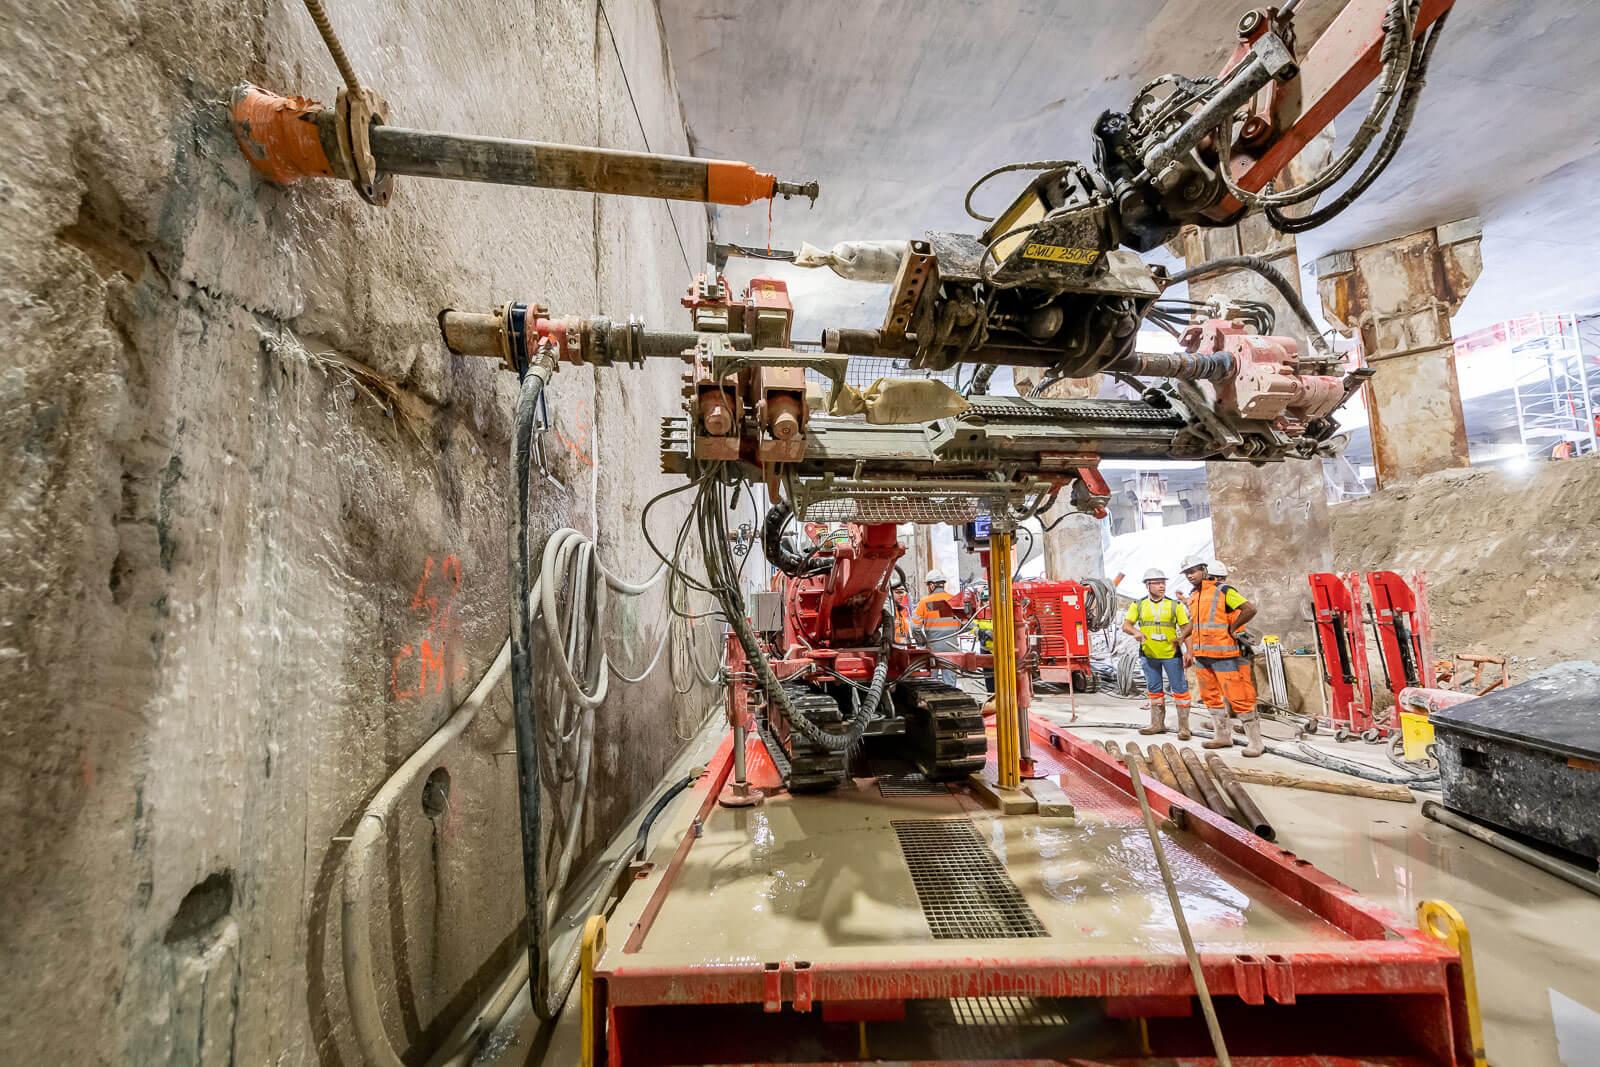 Tunnel/ compensation grouting/ ineyección de compensación